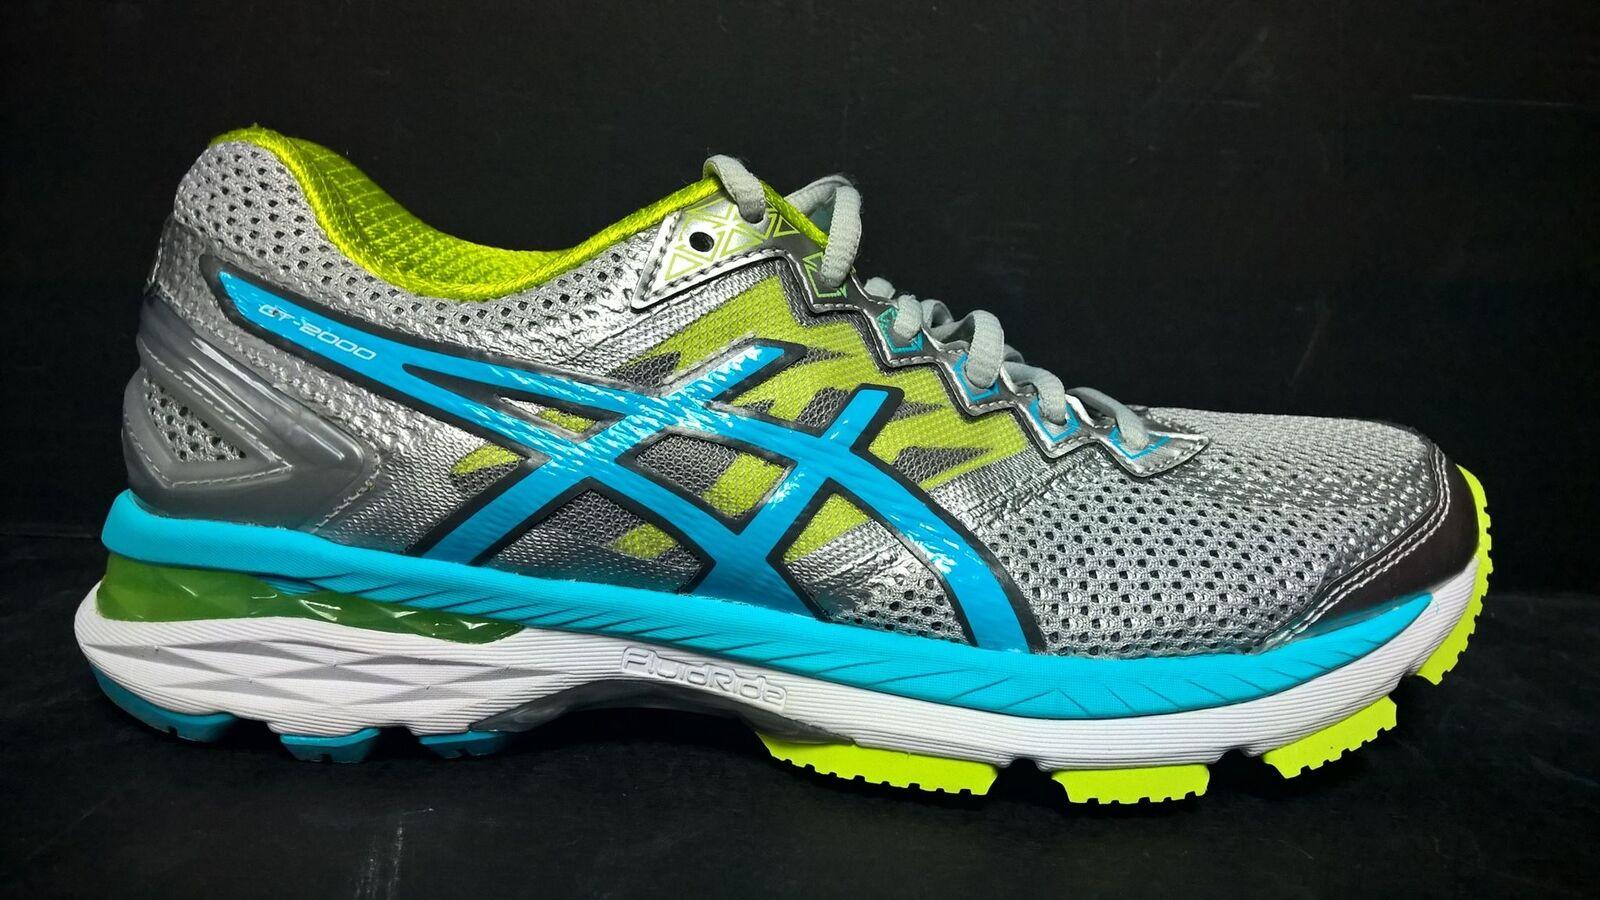 Asics Women's Size 6 GT 2000 4 Running Shoe T656N 9342 Gray Blue